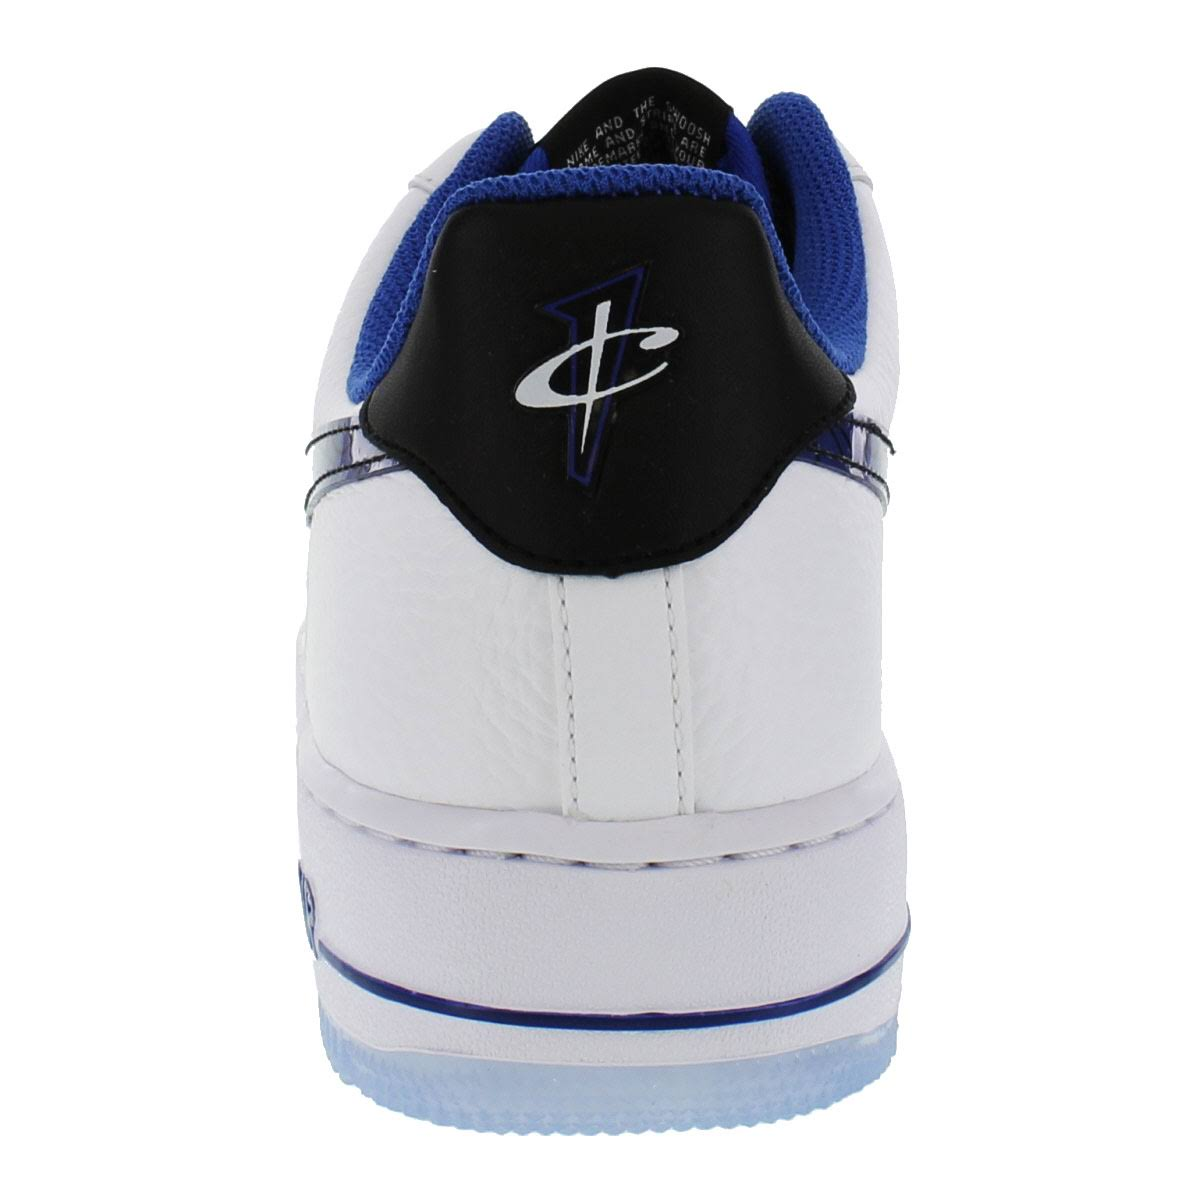 07 Tint Varsity Force Penny 1 Nike 13 Sz Royal Air Black qgCPwqvxRt